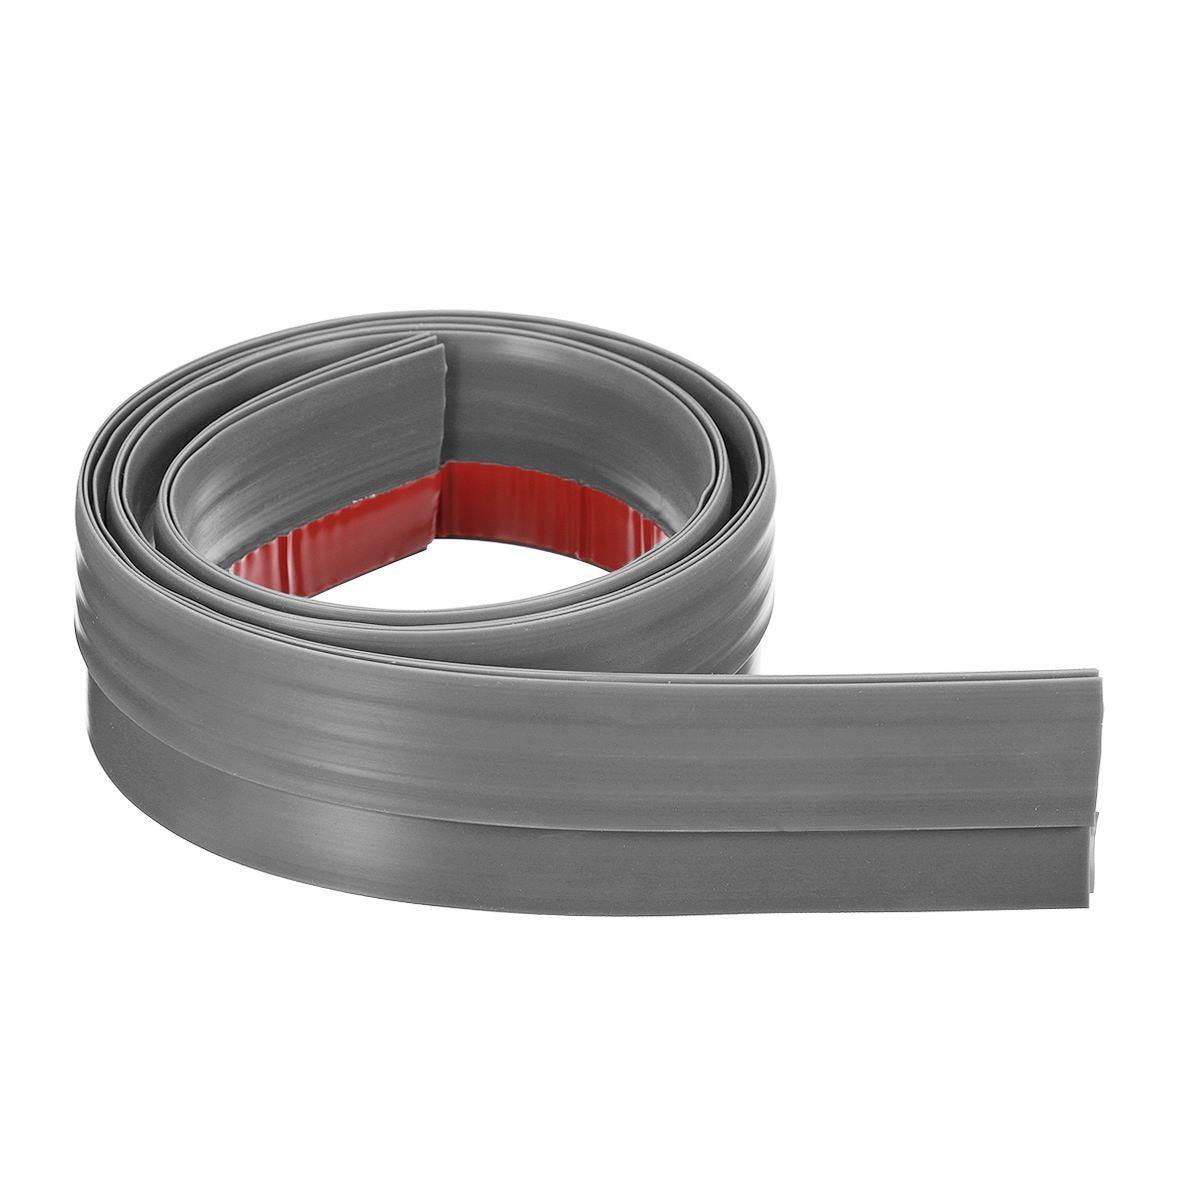 New Rubber Self-adhesive Door Bottom Sealing Strip Bedroom Soundproof Windproof Sealer Guard Stopper Furniture Accessories 5 Col